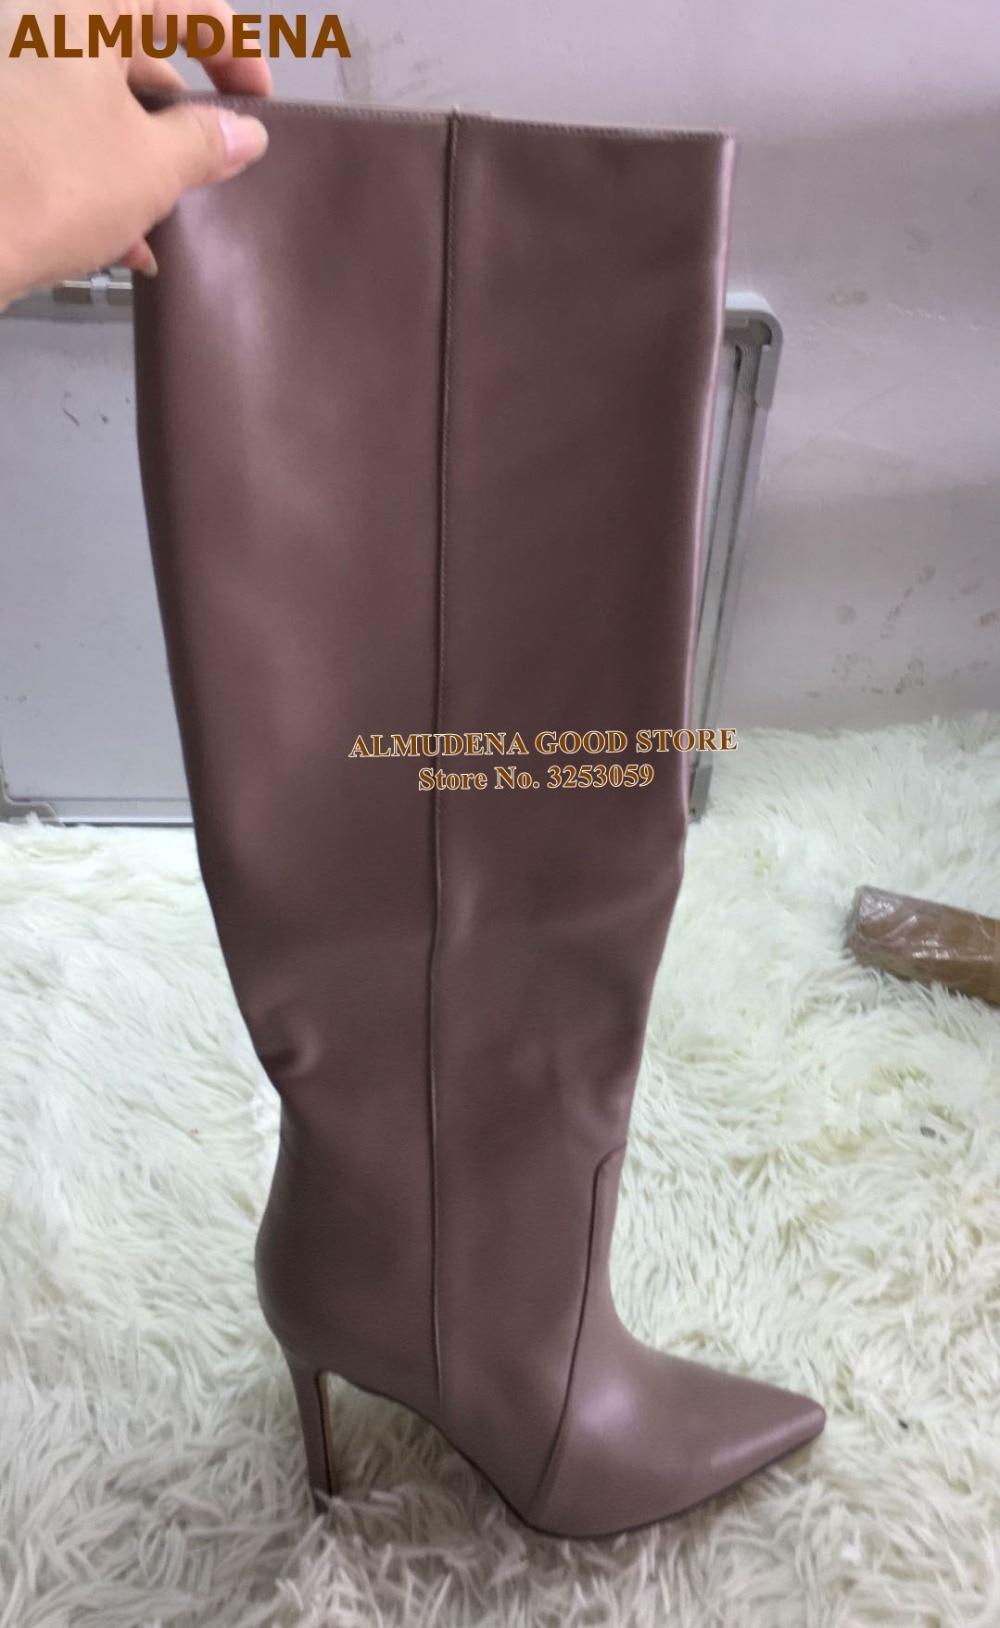 1910S1148 咖啡色羊皮细高跟尖头及膝靴 精品鞋9-230